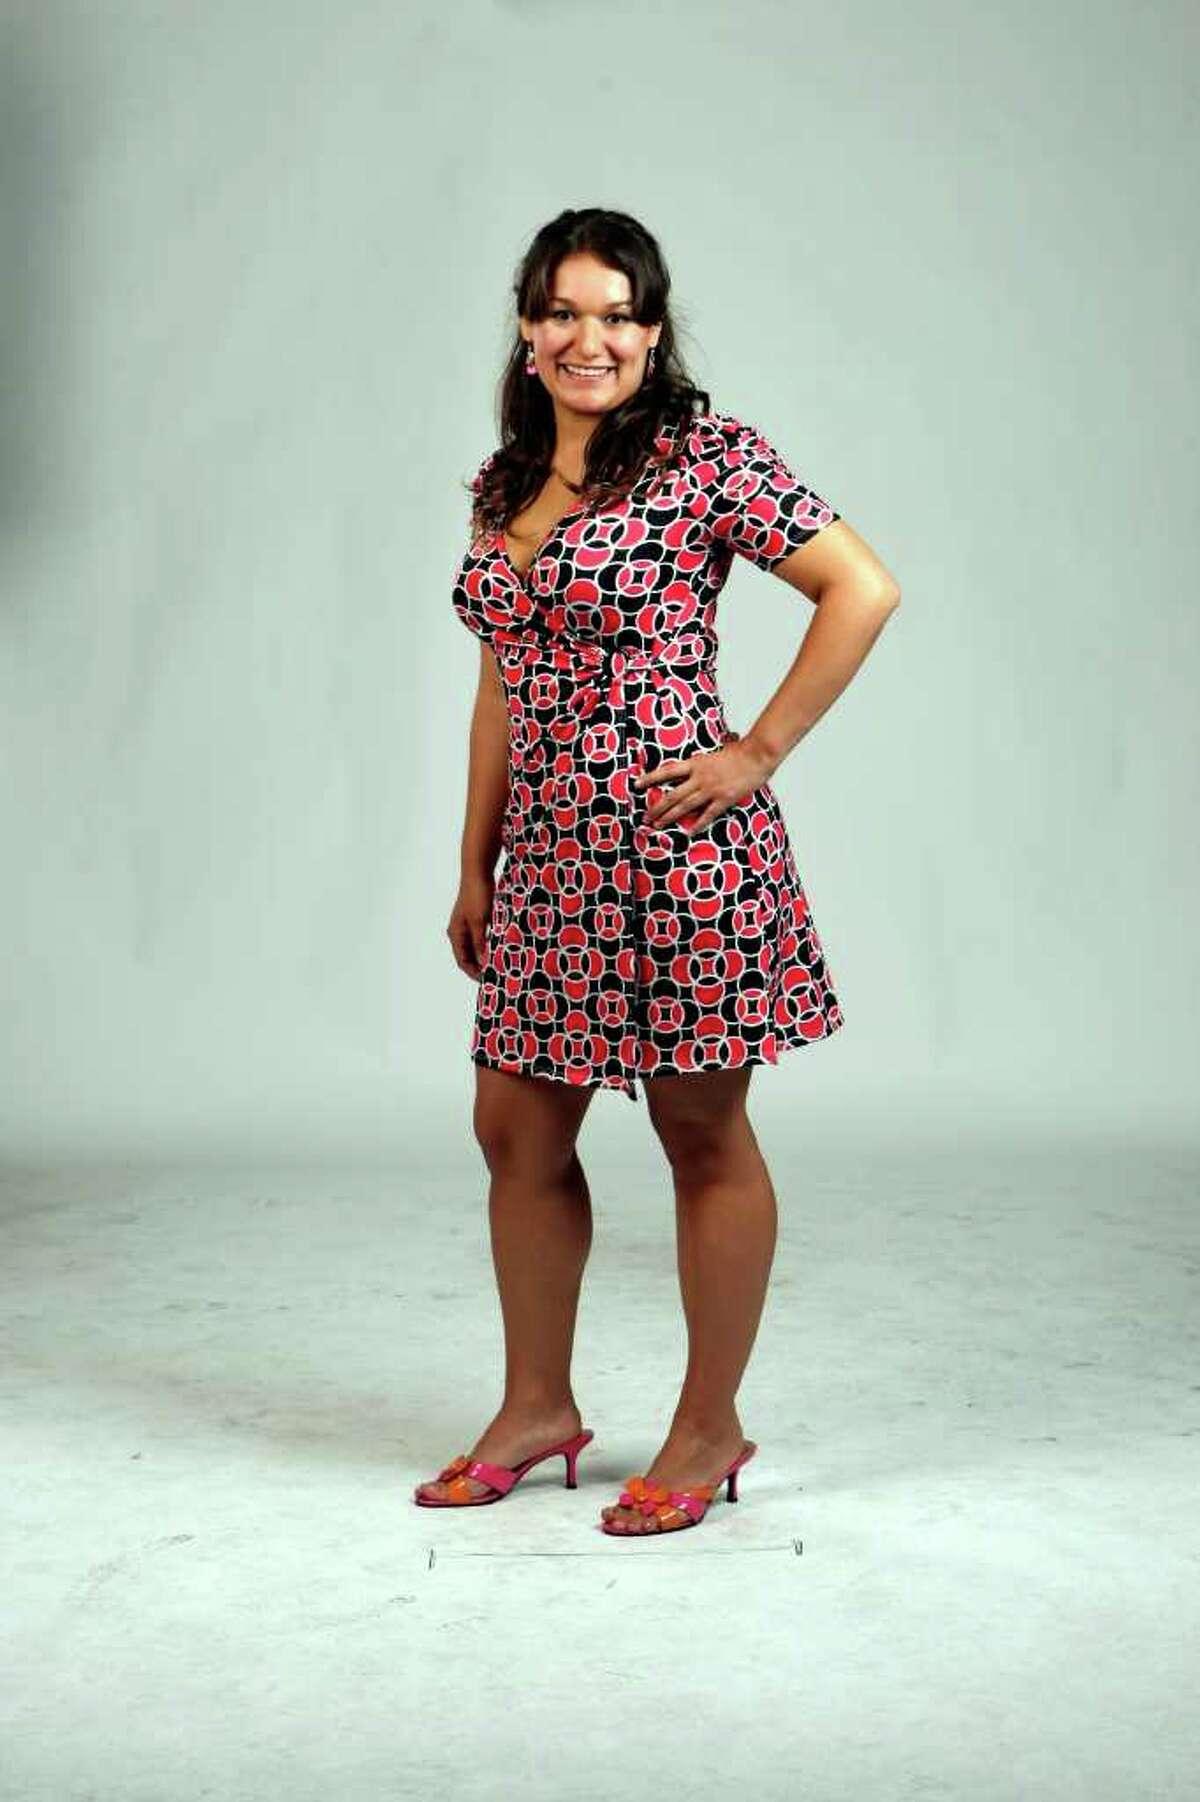 CONEXION: Karin Wedholm, 2011 Top 10 Hottest Latina contestants. Photographed Sunday April 10, 2011 HELEN L. MONTOYA/hmontoya@express-news.net